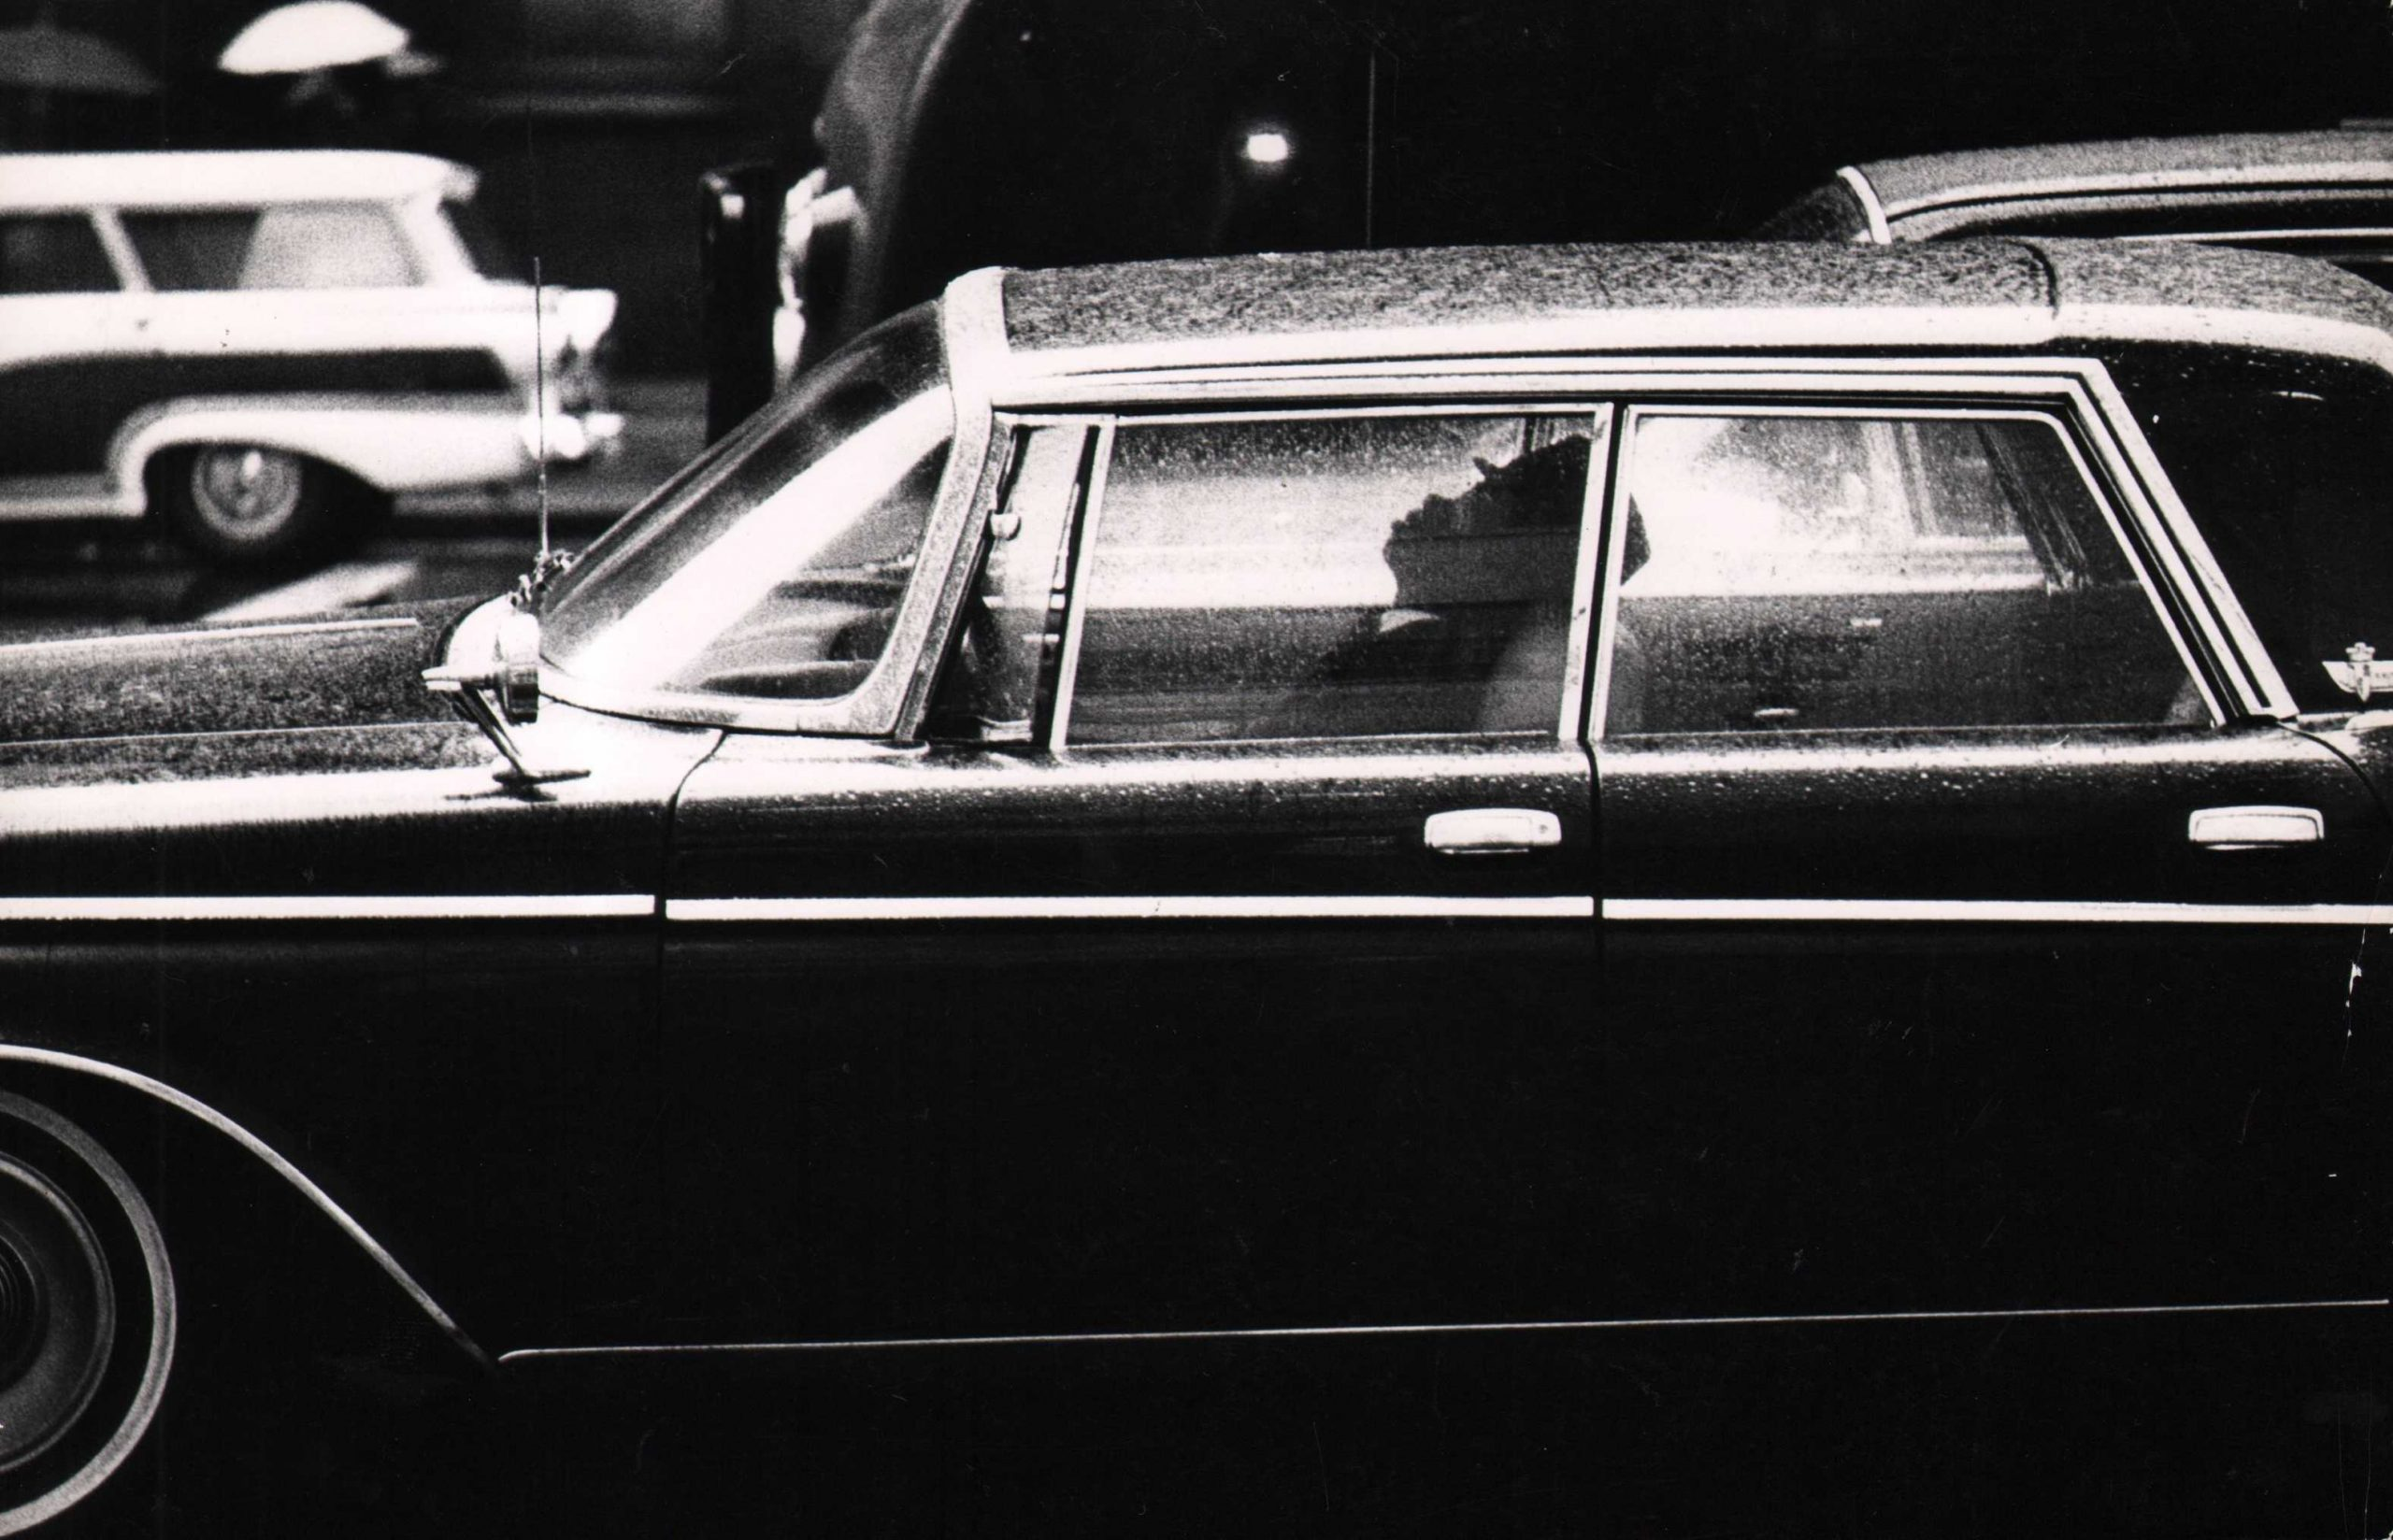 Jan Lukas, New York, 1964